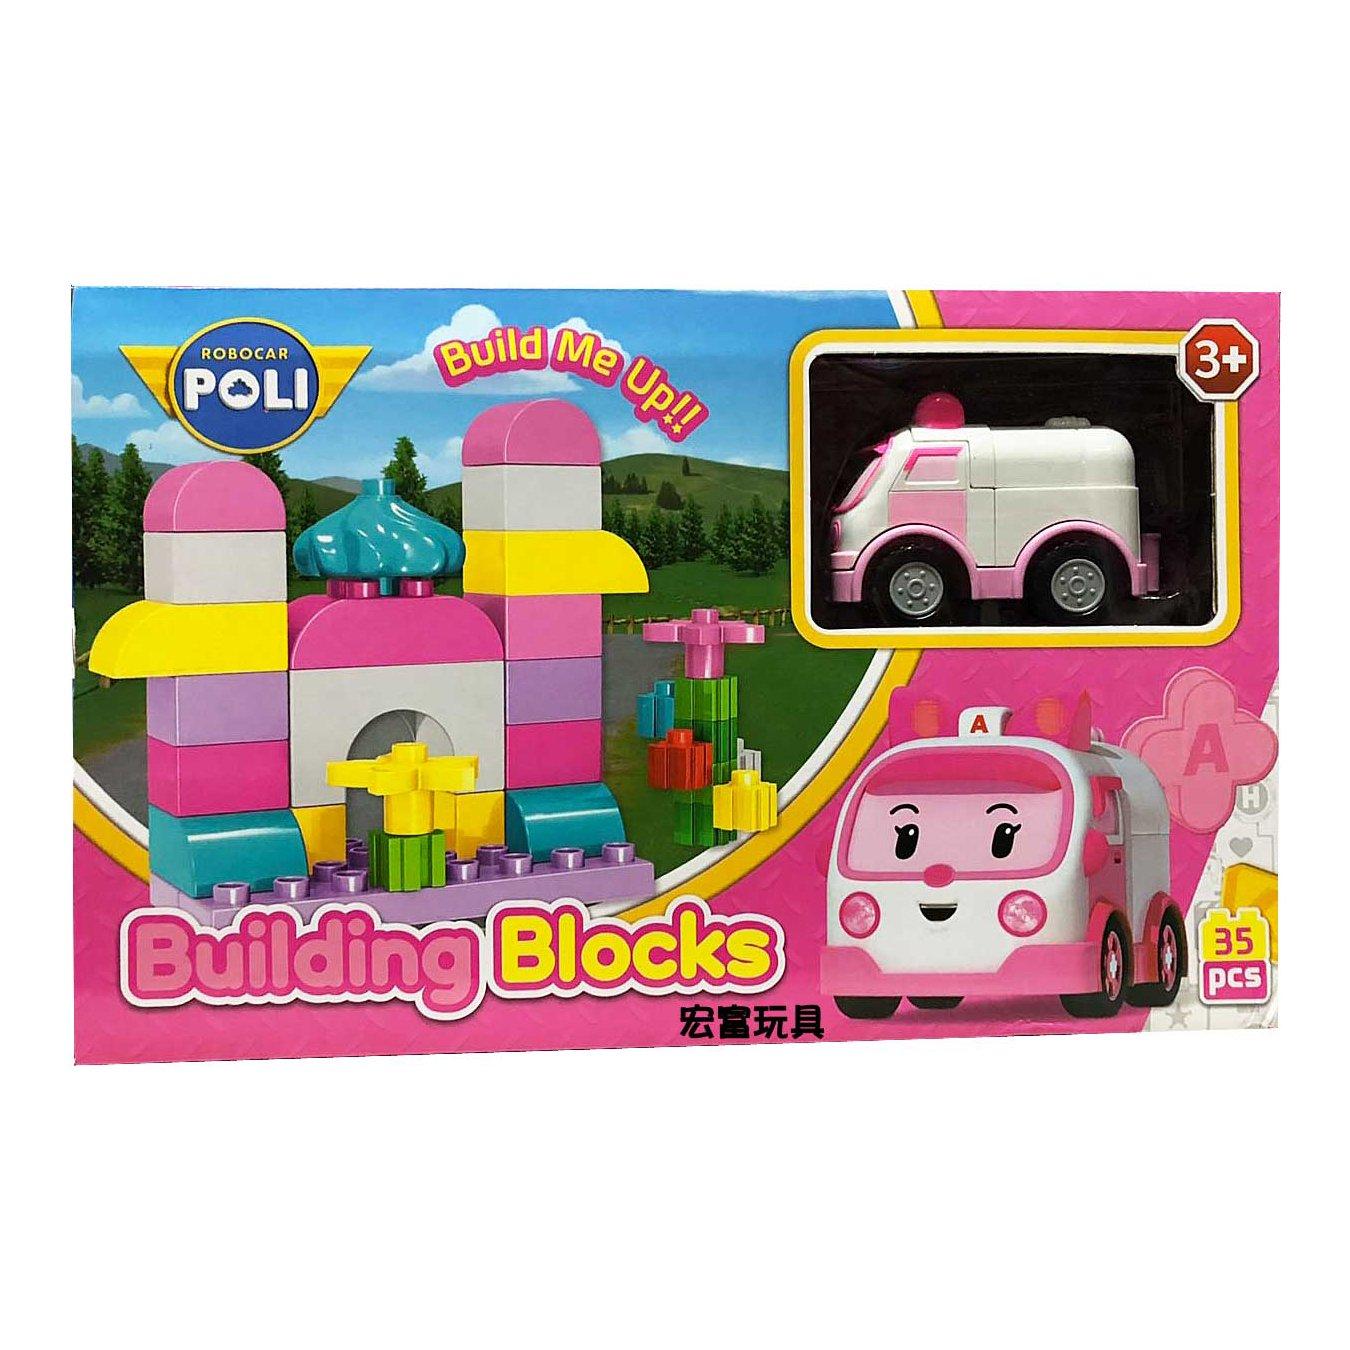 Robo car POLI 波力 安寶積木組【特價品】